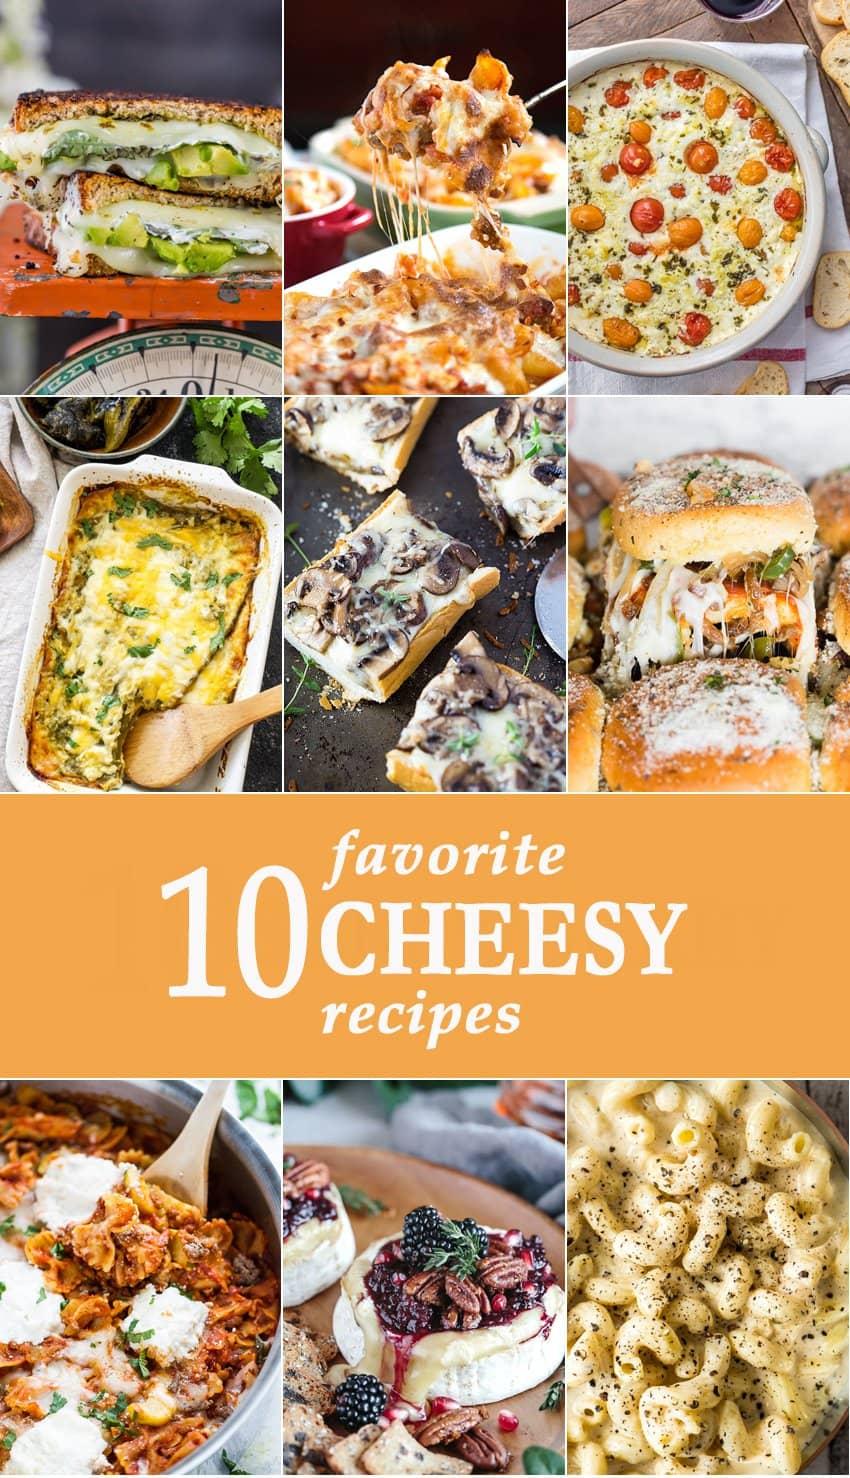 10 Favorite Cheesy Recipes